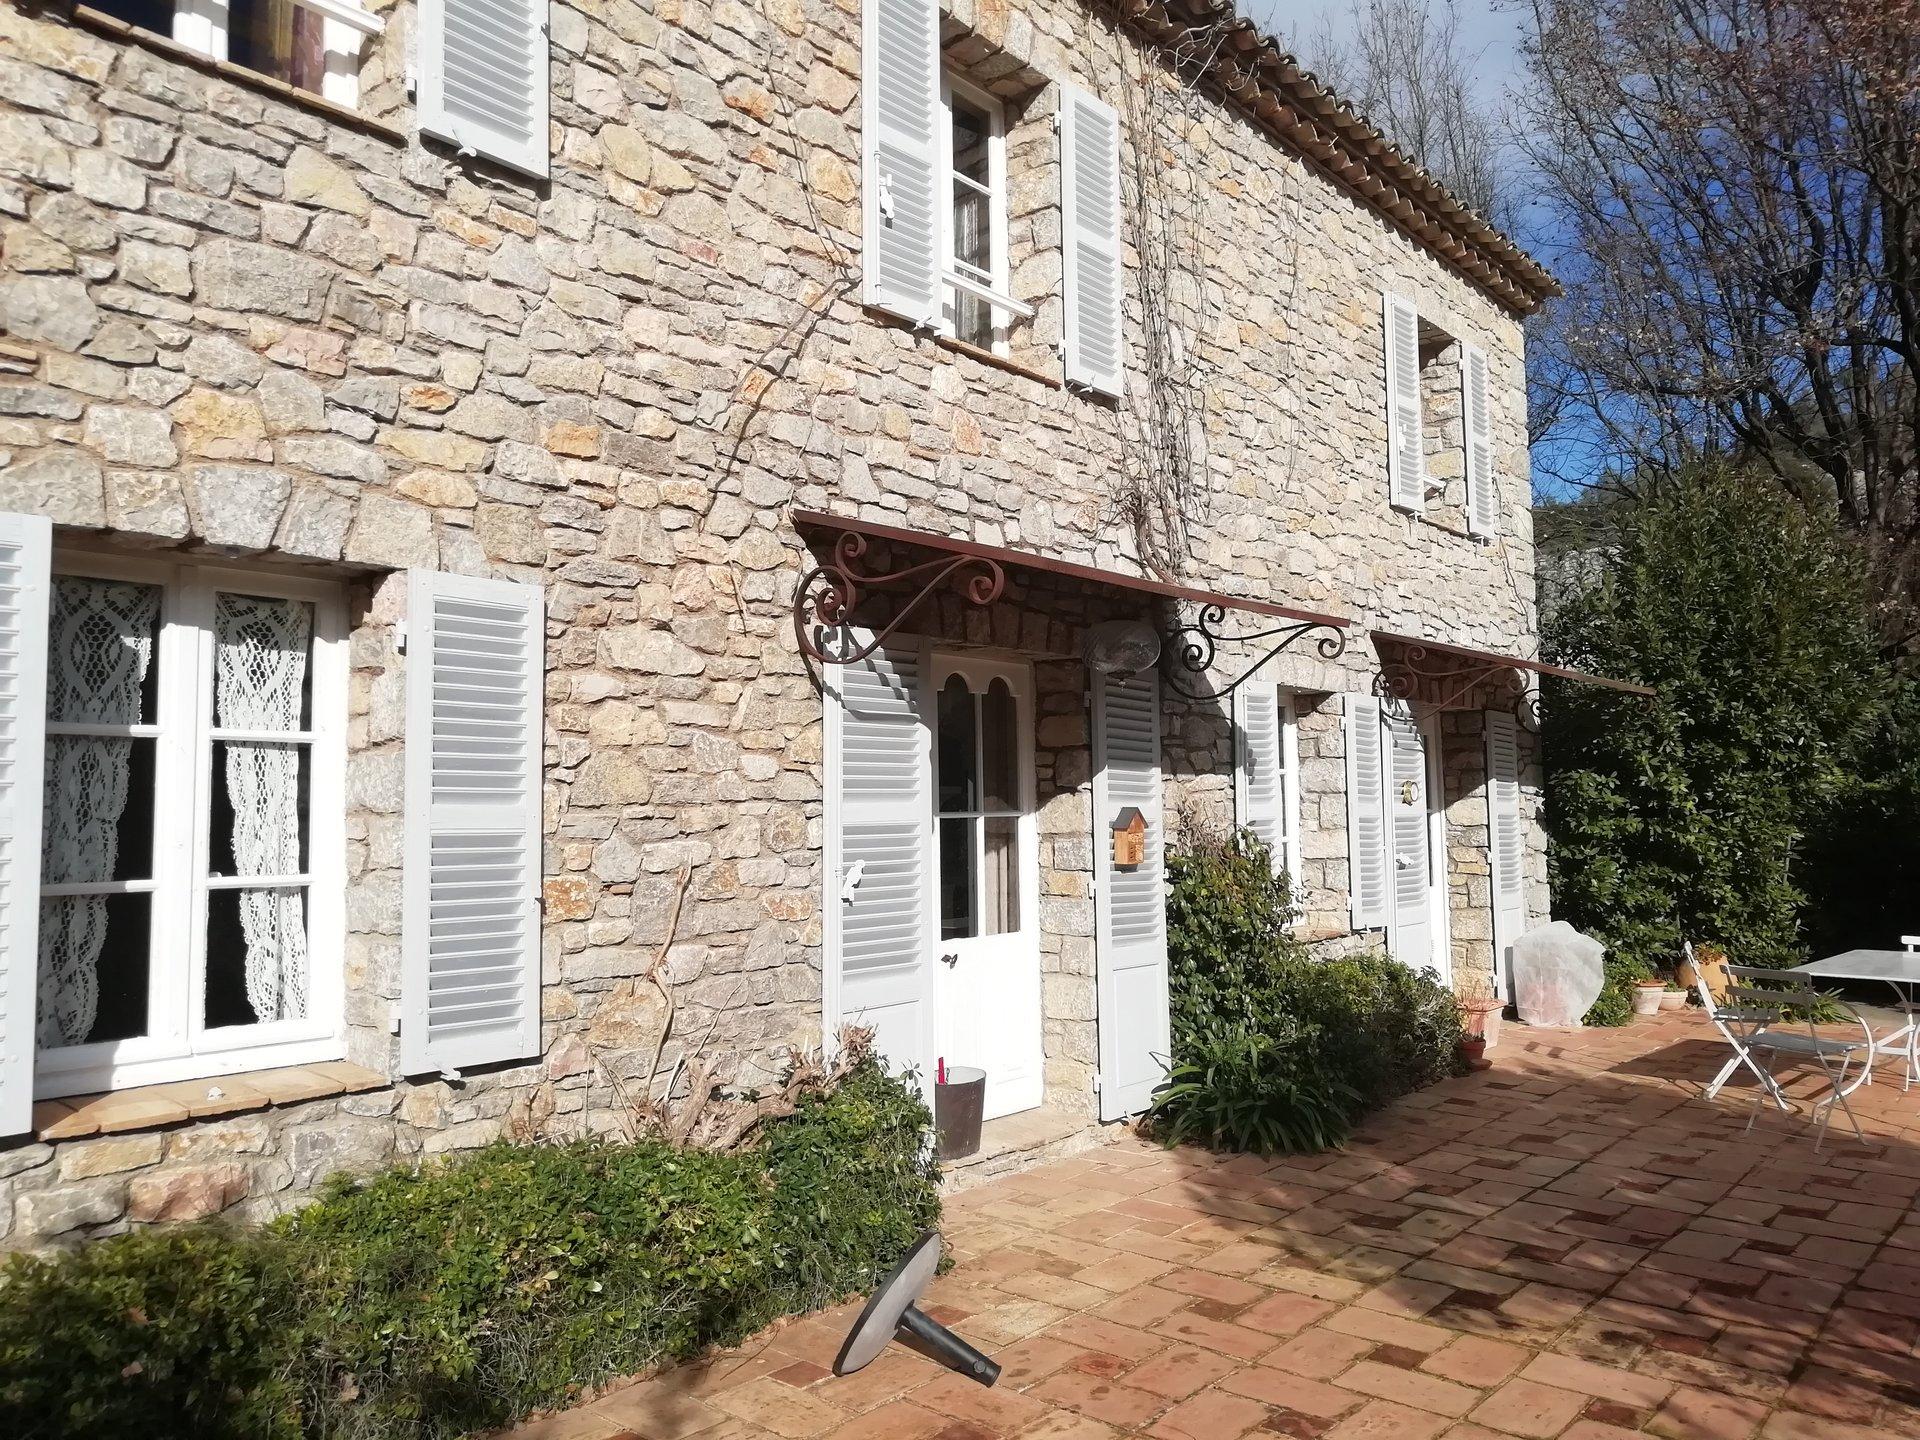 Bastide and its mill in Taradeau